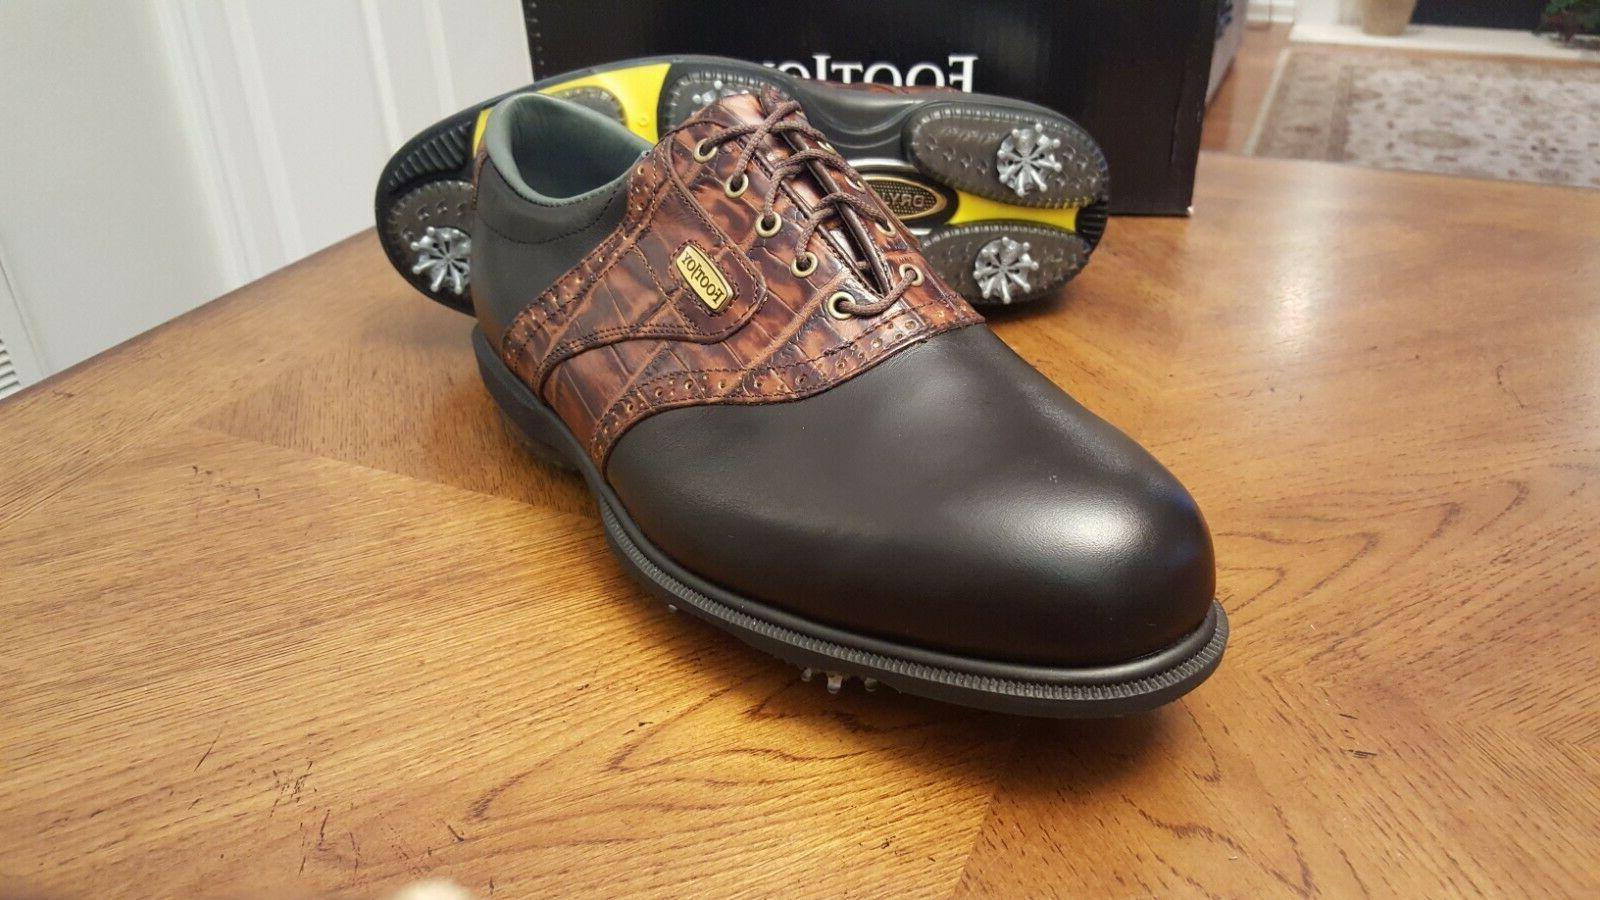 2014 Golf Shoes Blk/Brn RET Beautiful